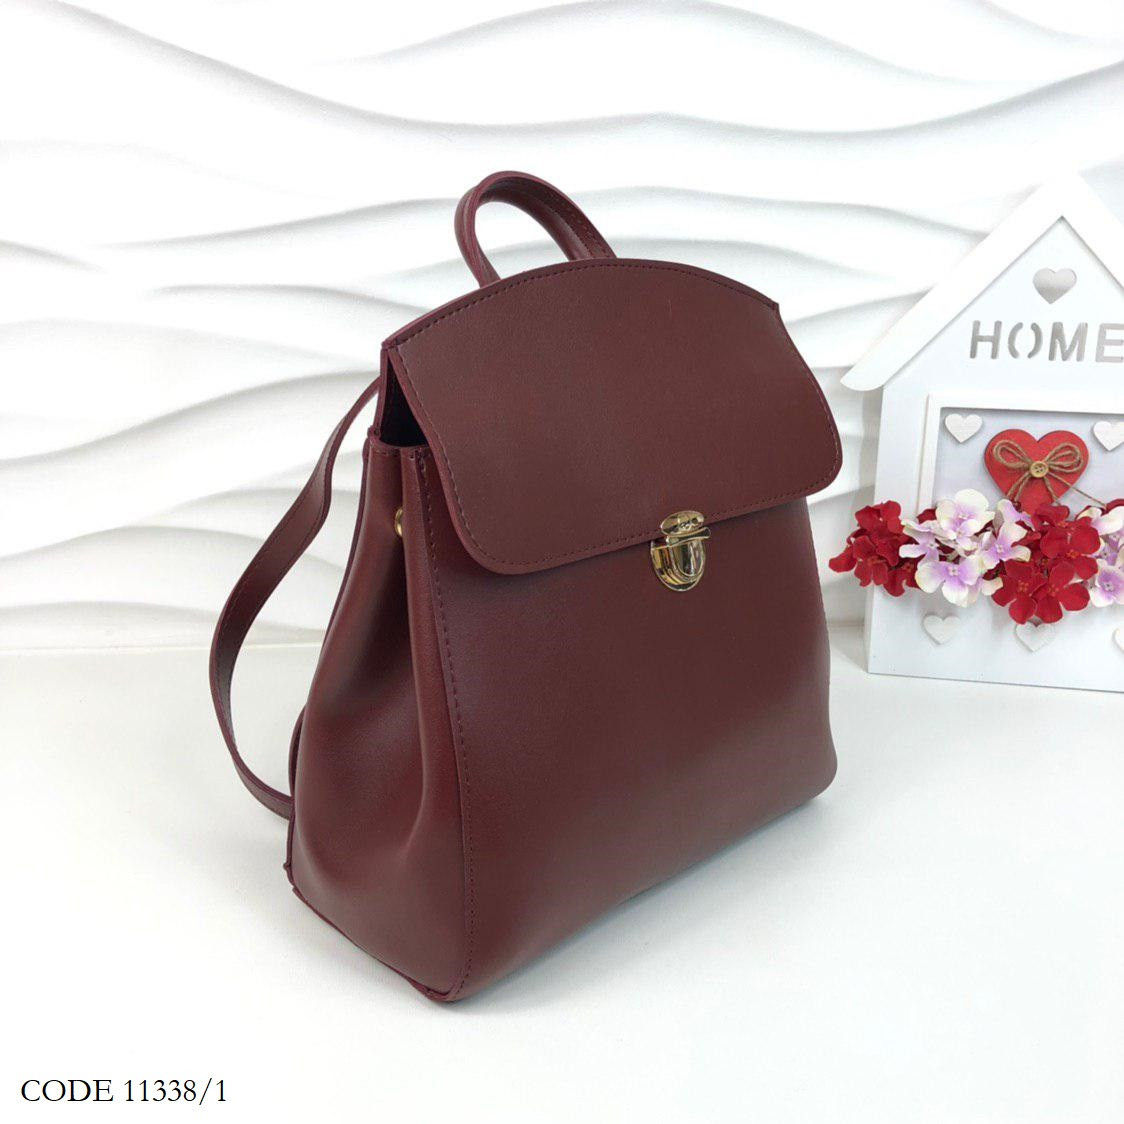 ccf3f67be296 Сумка-рюкзак из гладкой экокожи: продажа, цена в Киеве. женские ...